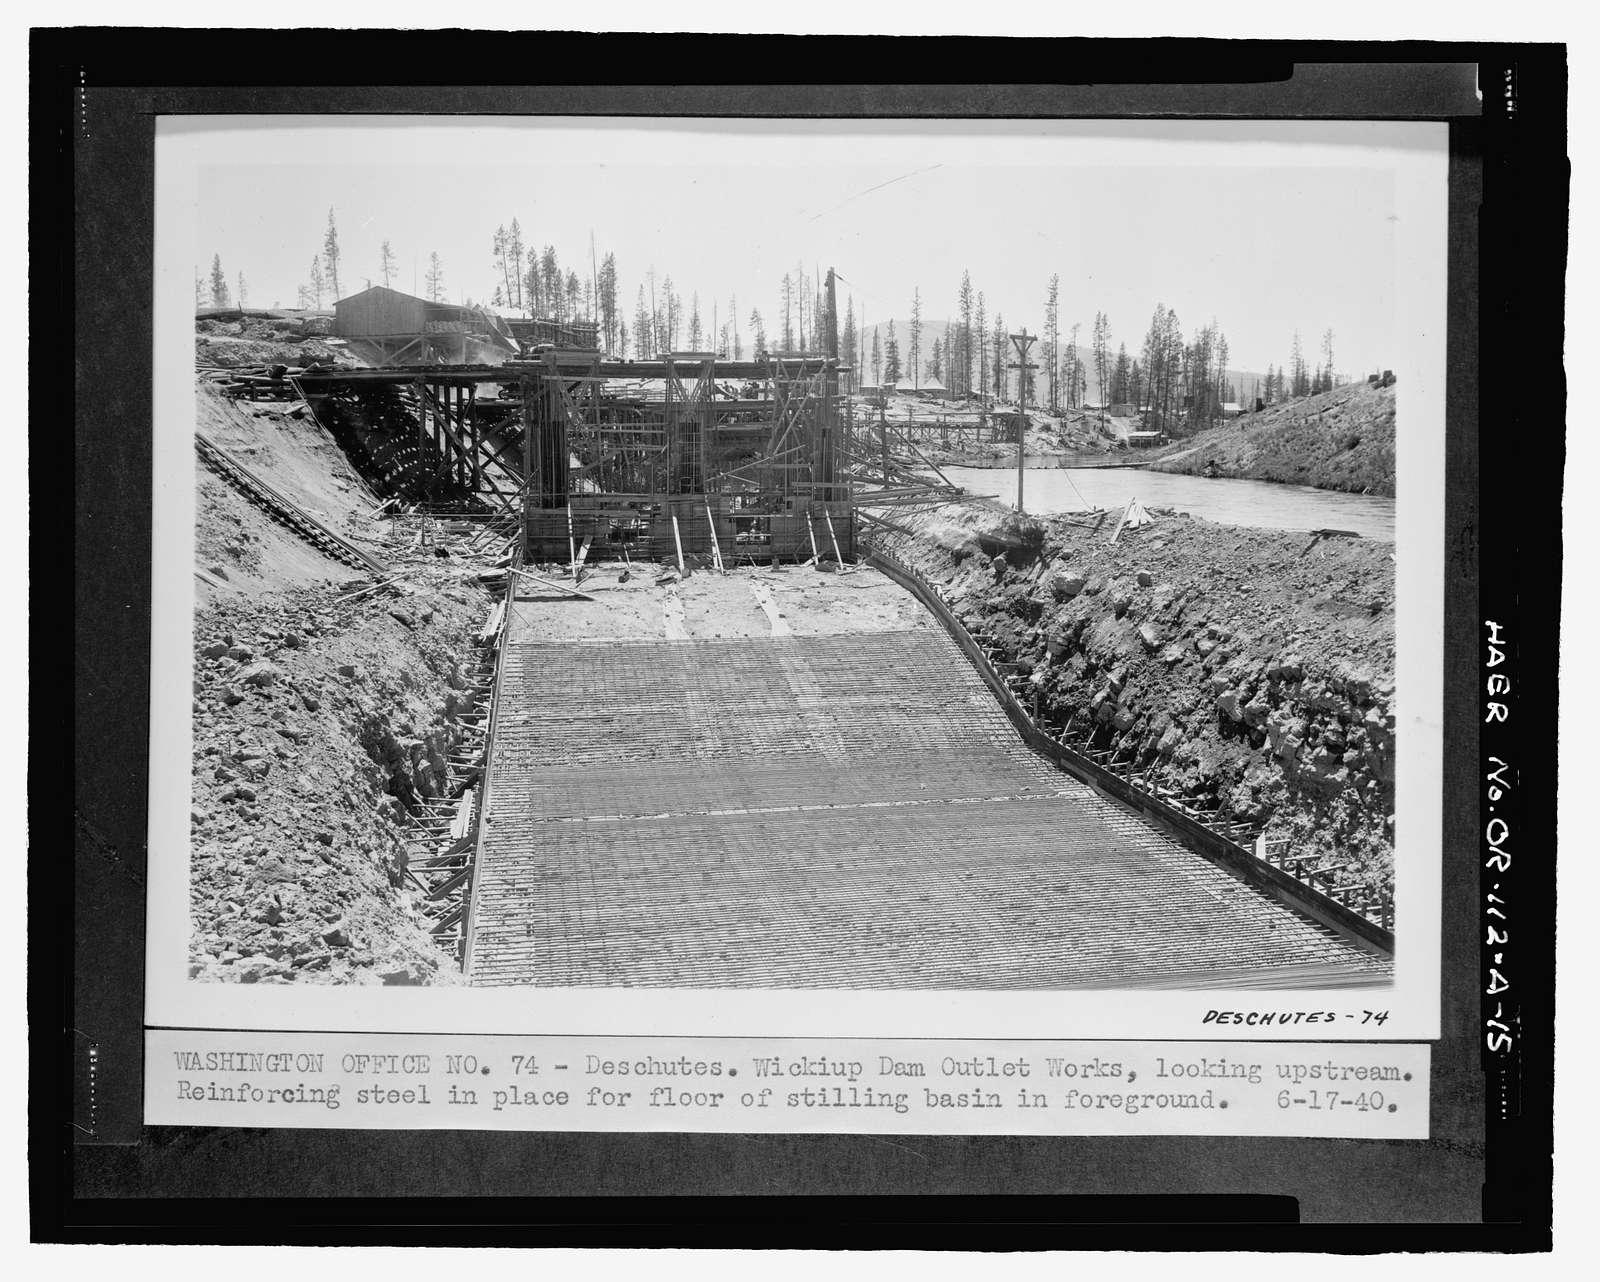 Wickiup Dam, Outlet Works, Deschutes River, La Pine, Deschutes County, OR